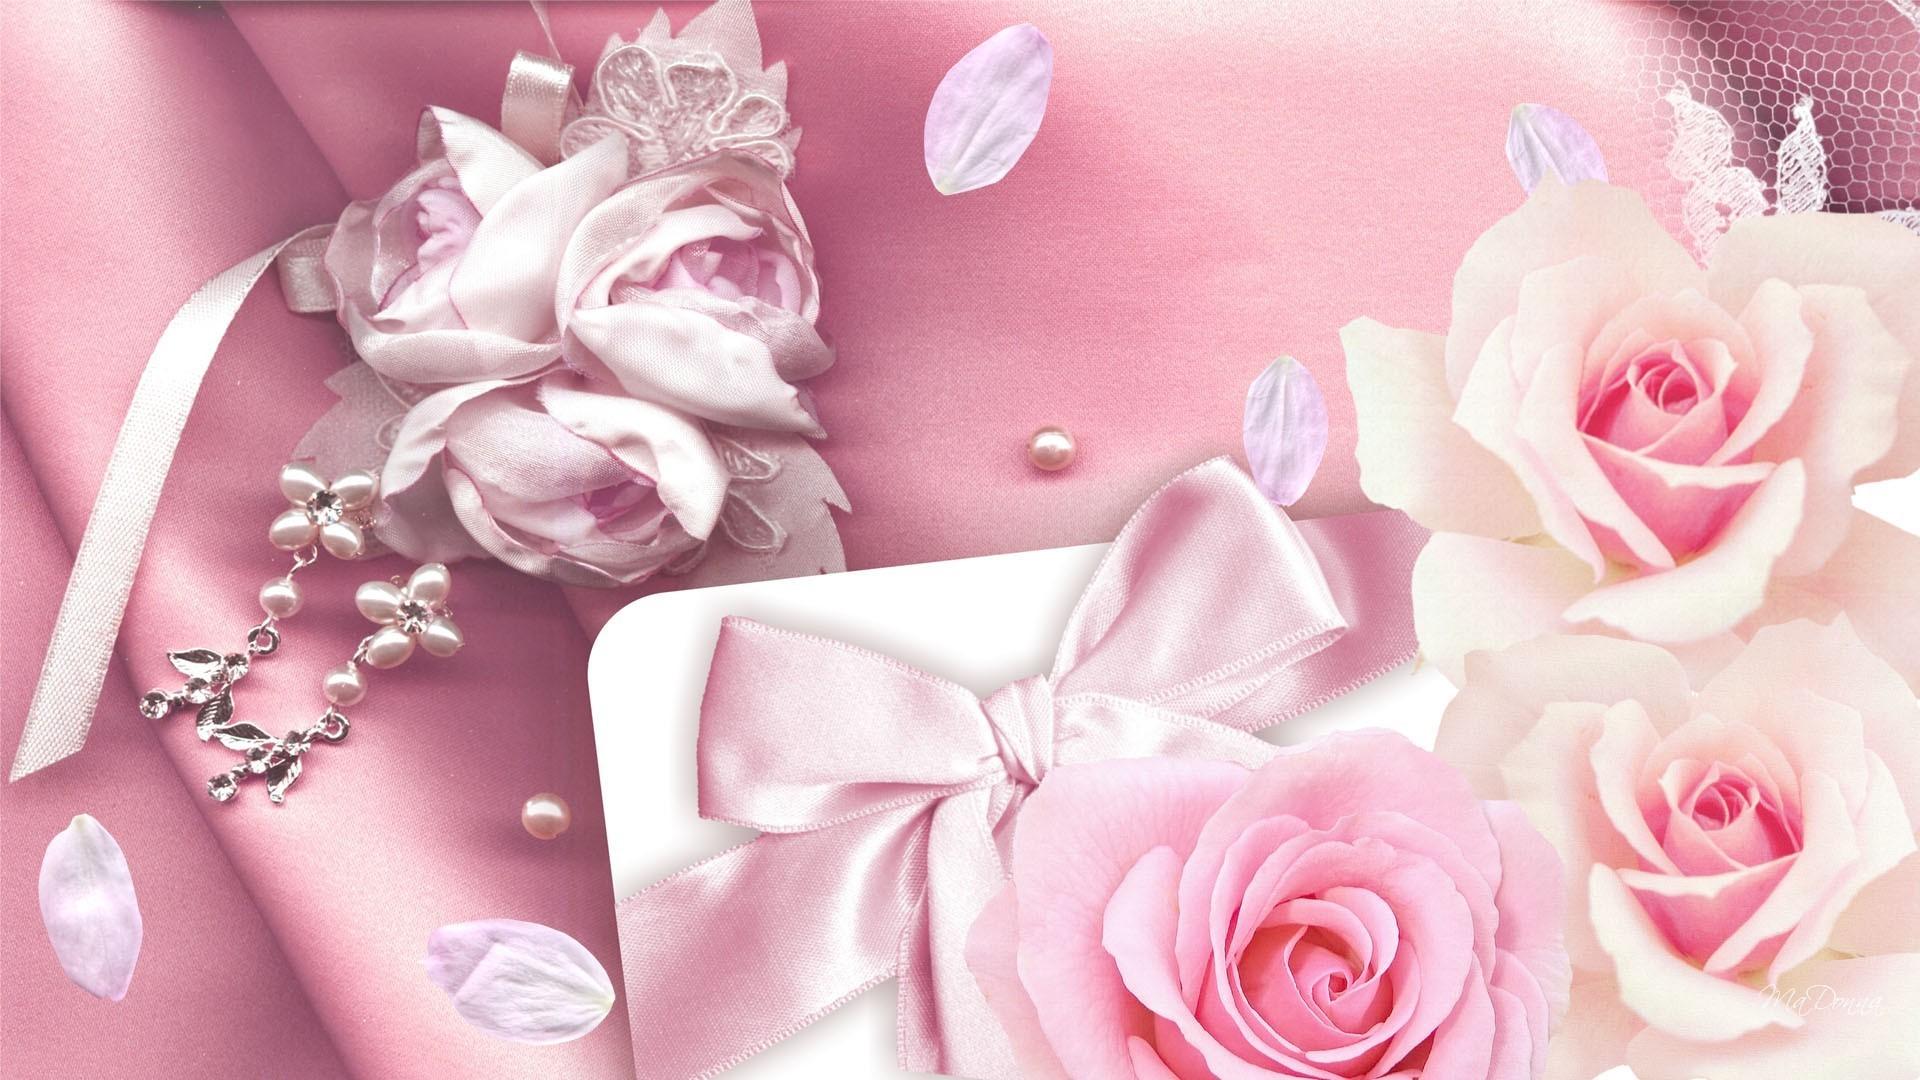 Res: 1920x1080, Feminine Pinks Silk Ribbon Bow Petals Pearls Pink Roses Lace Full HD  Wallpaper -